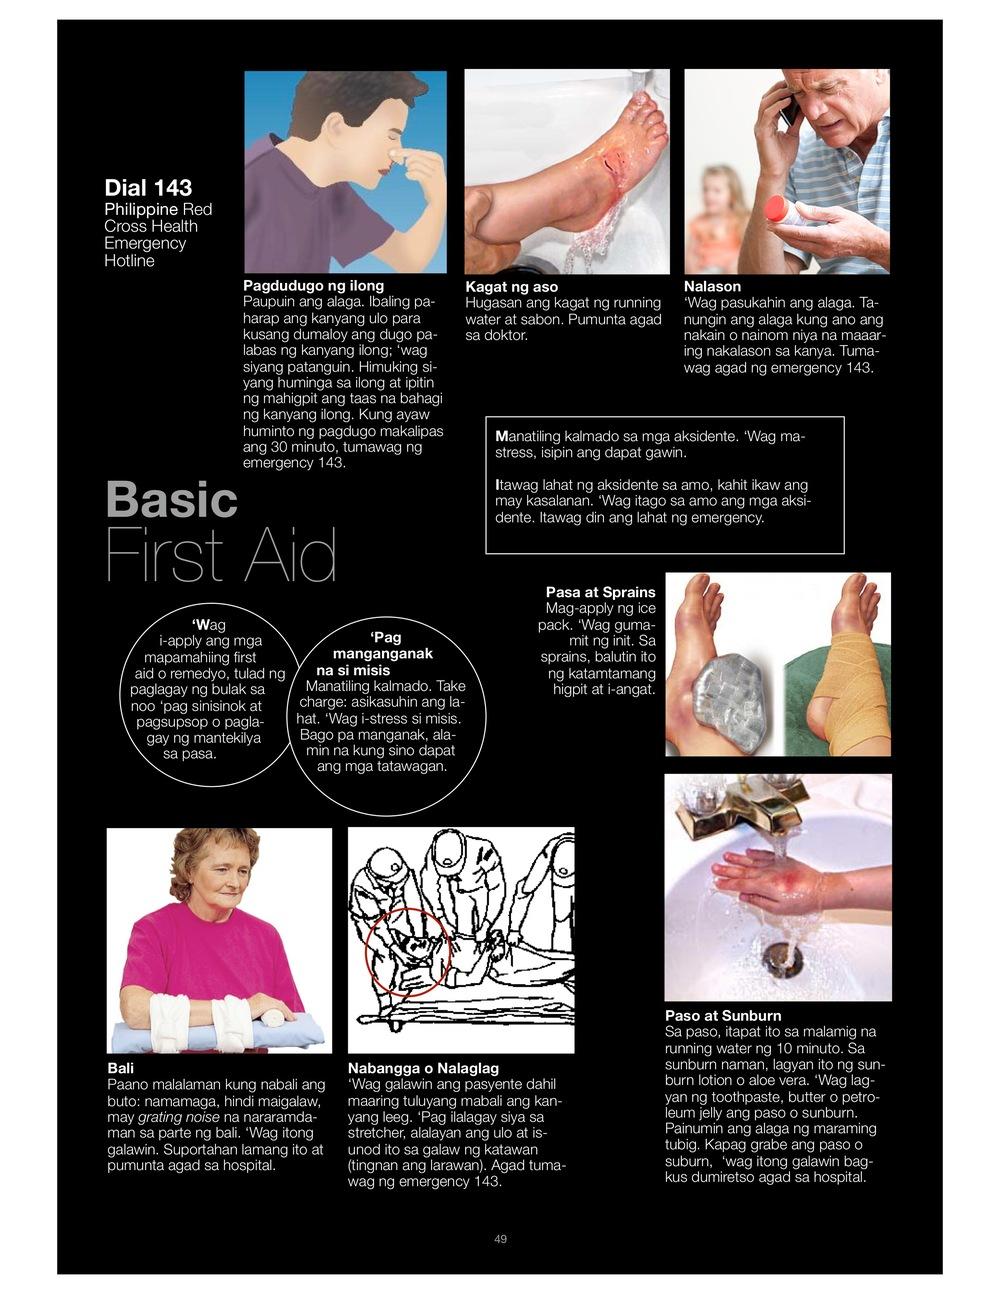 MaidProvider.ph Training Manual NO WATERMARK.pdf 51.jpeg